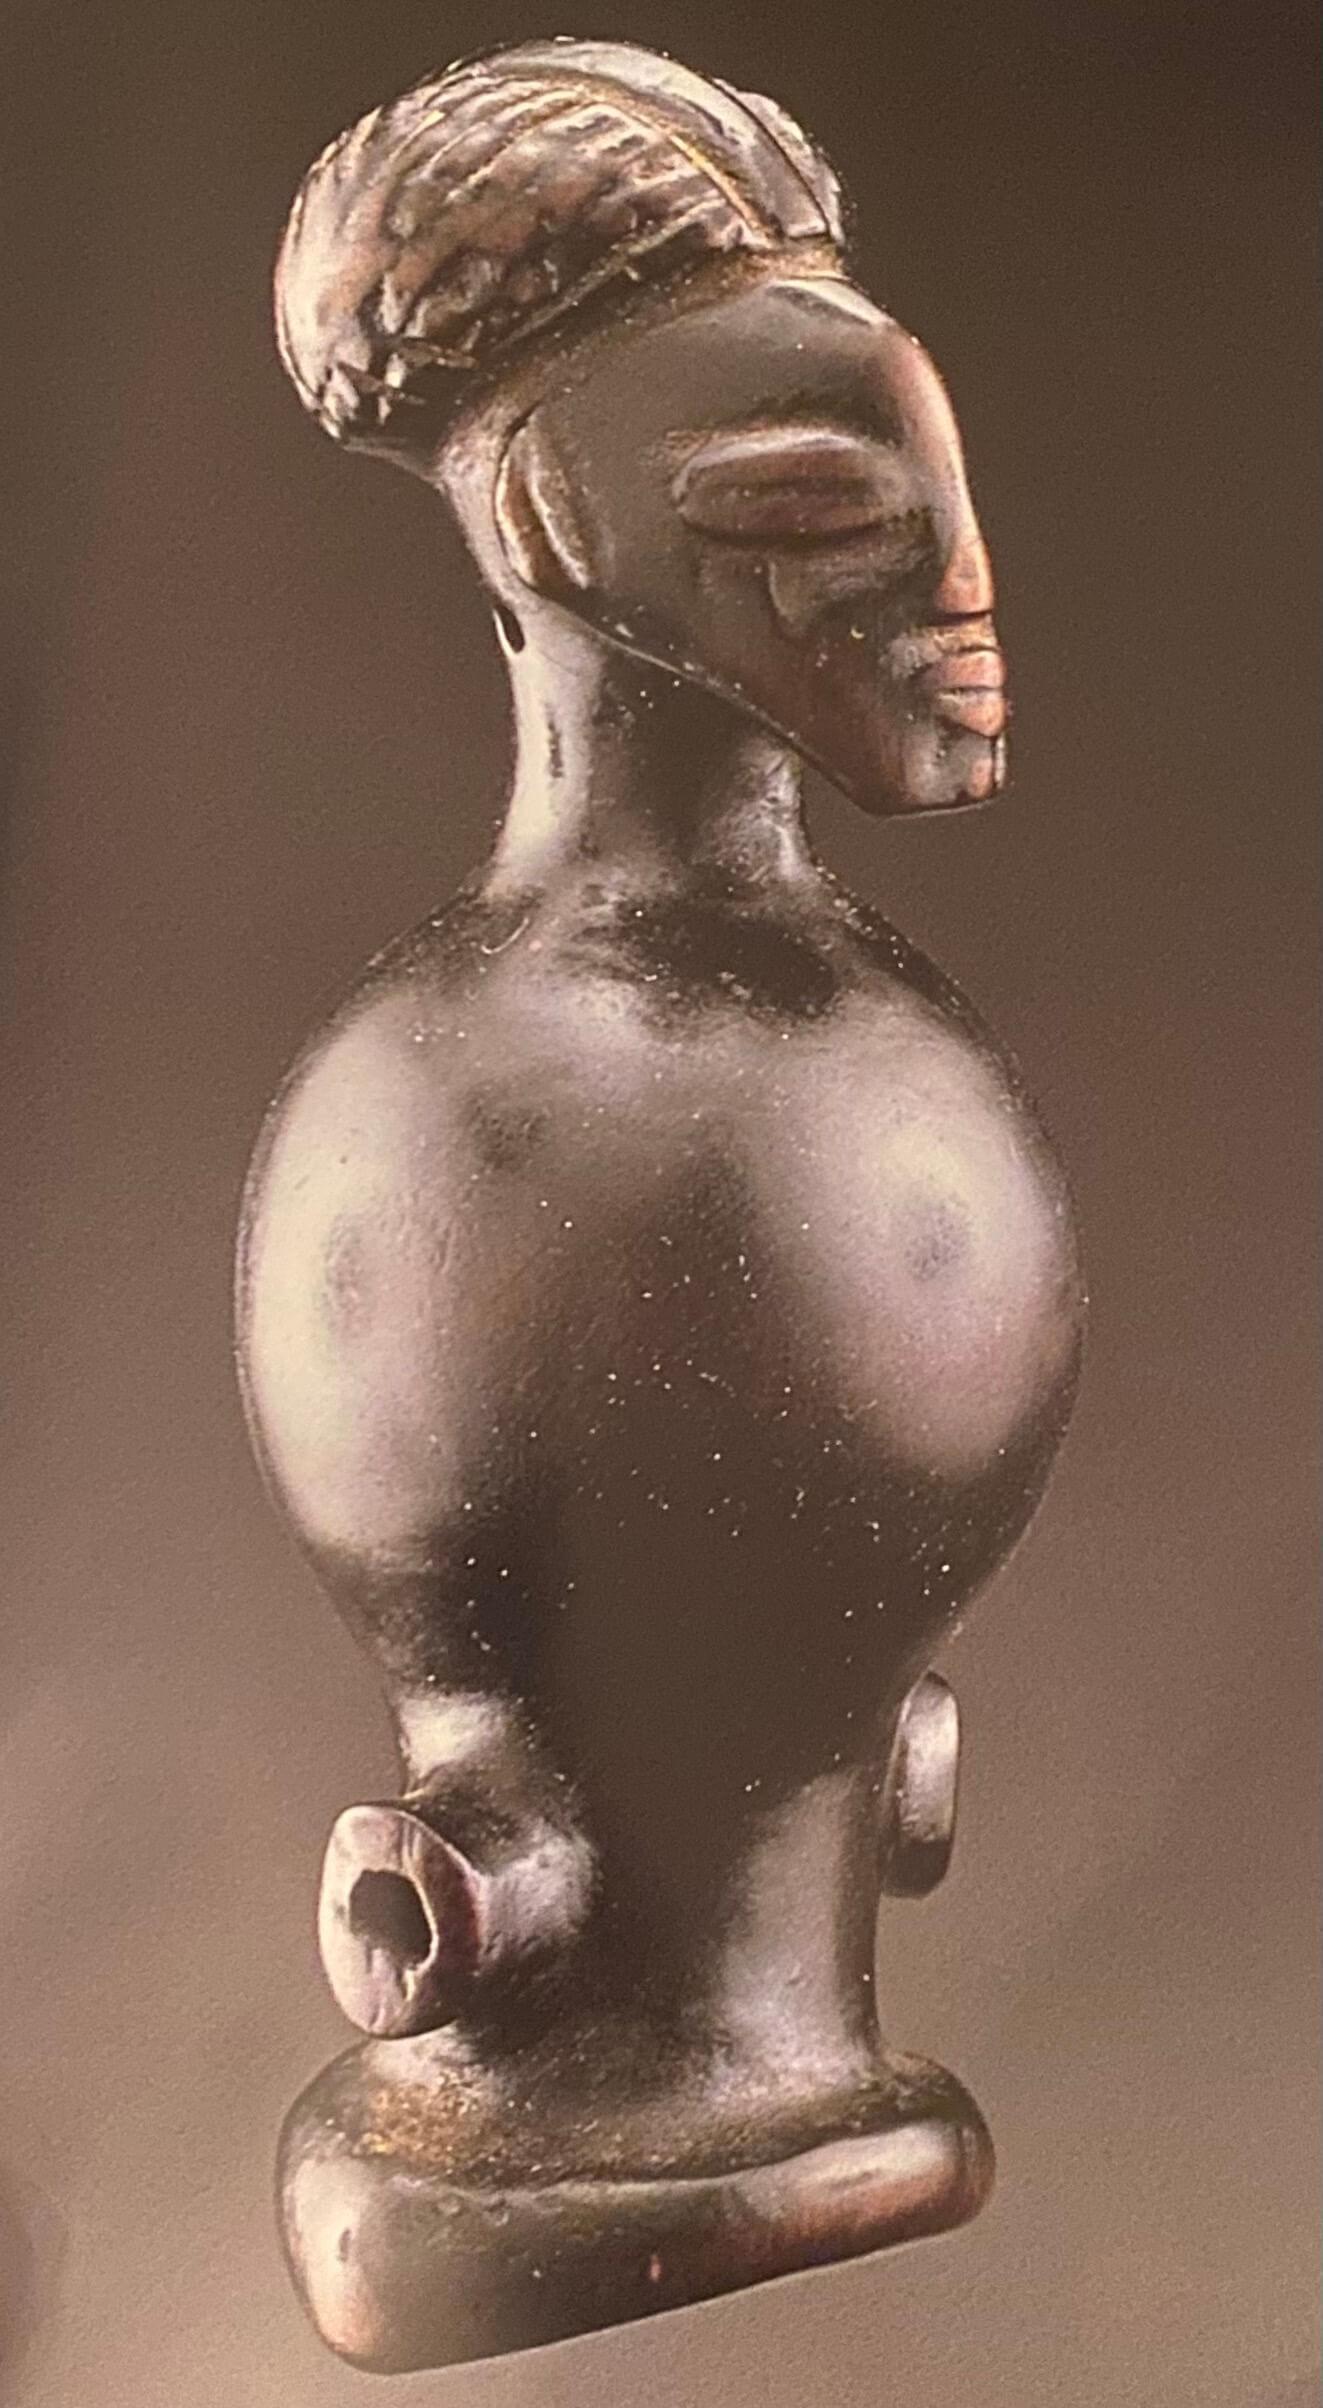 Magazine Art Tribal n°02, printemps 2003 | Sifflets tchokwe | Editions D, Frédéric Dawance